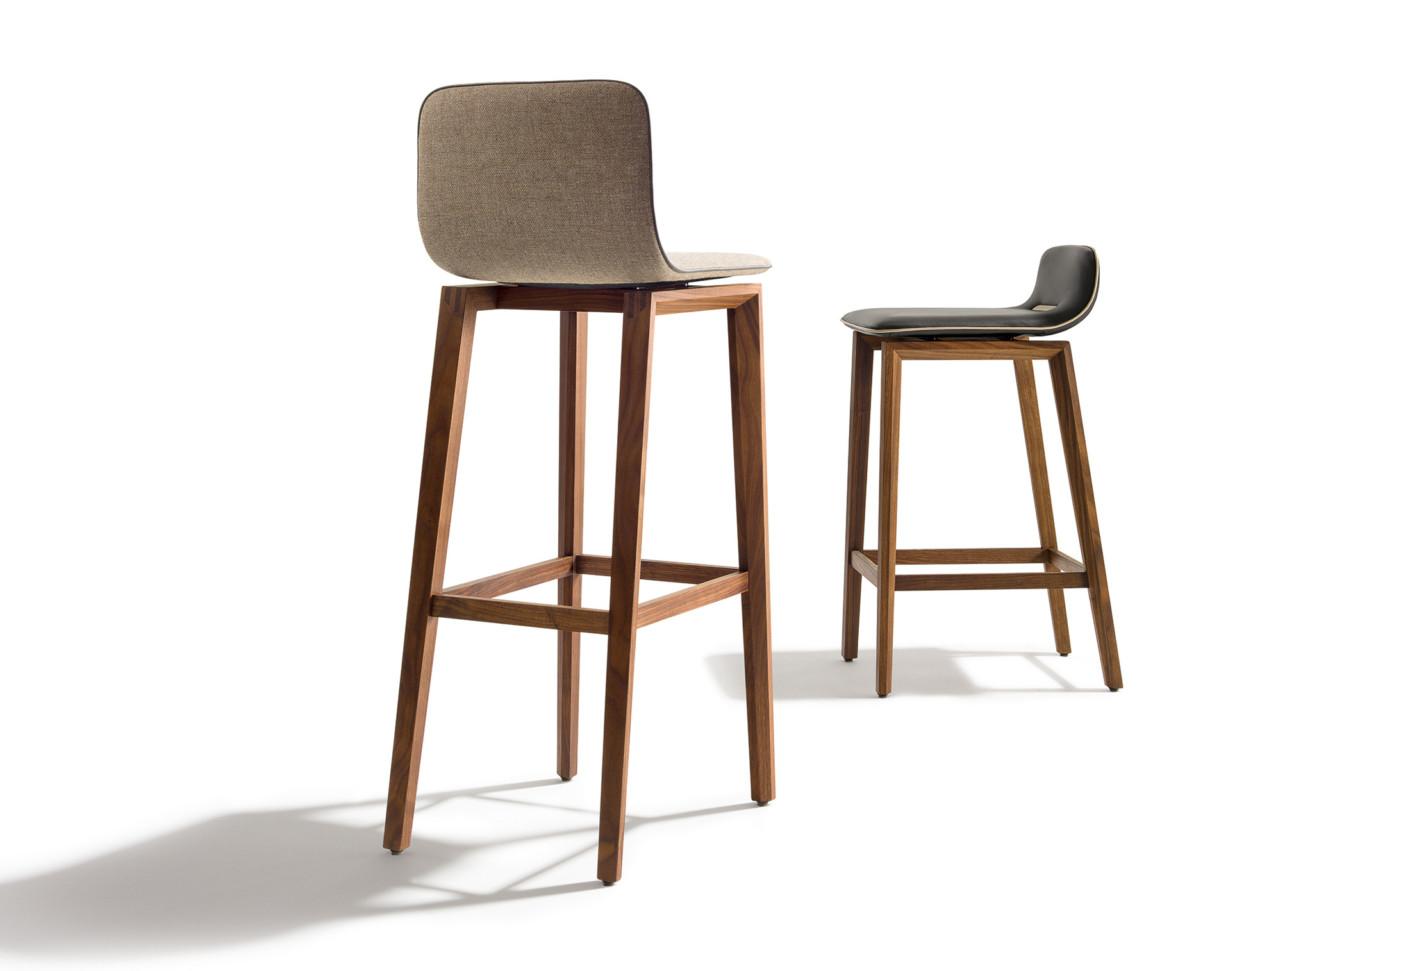 ark barstool with high backrest by TEAM 7 | STYLEPARK